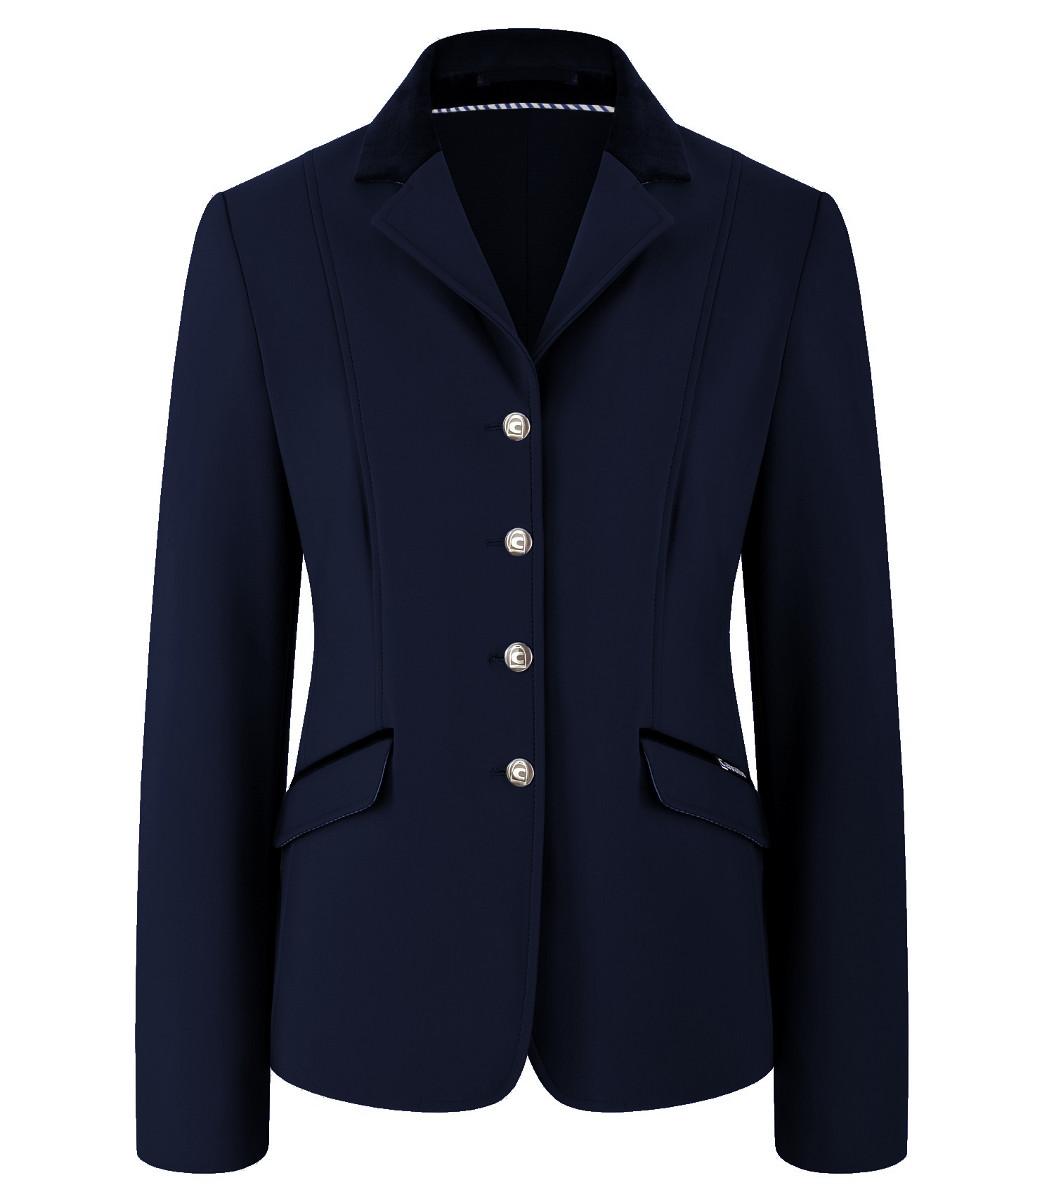 Cavallo Galathea Sport Softshell Ladies Show Jacket - Marine Blue ...